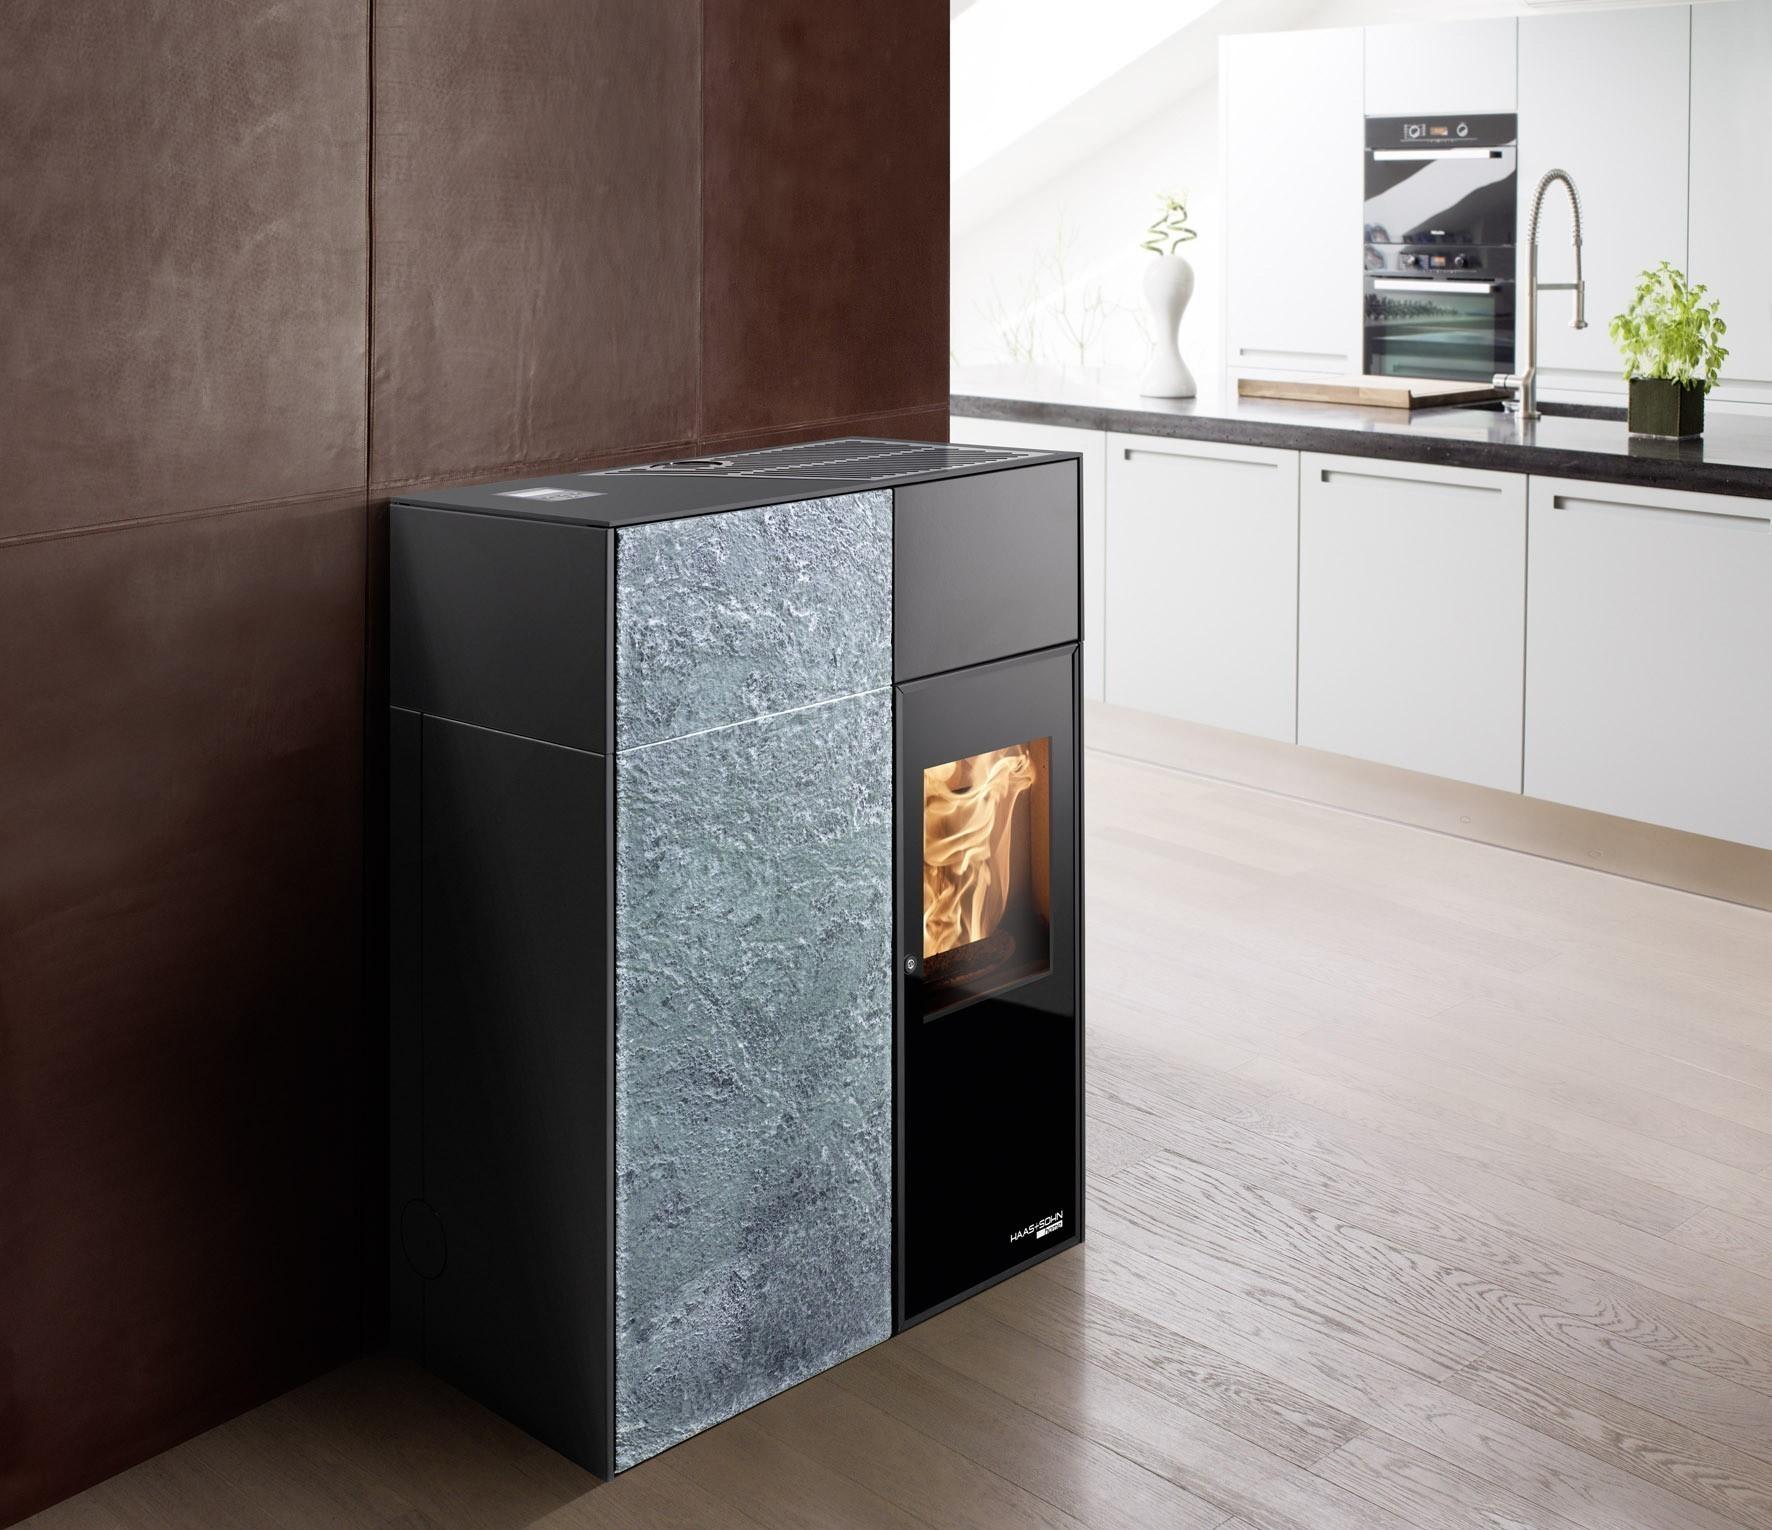 pelletofen haas sohn catania ii rlu schwarz speckstein 8kw bei. Black Bedroom Furniture Sets. Home Design Ideas